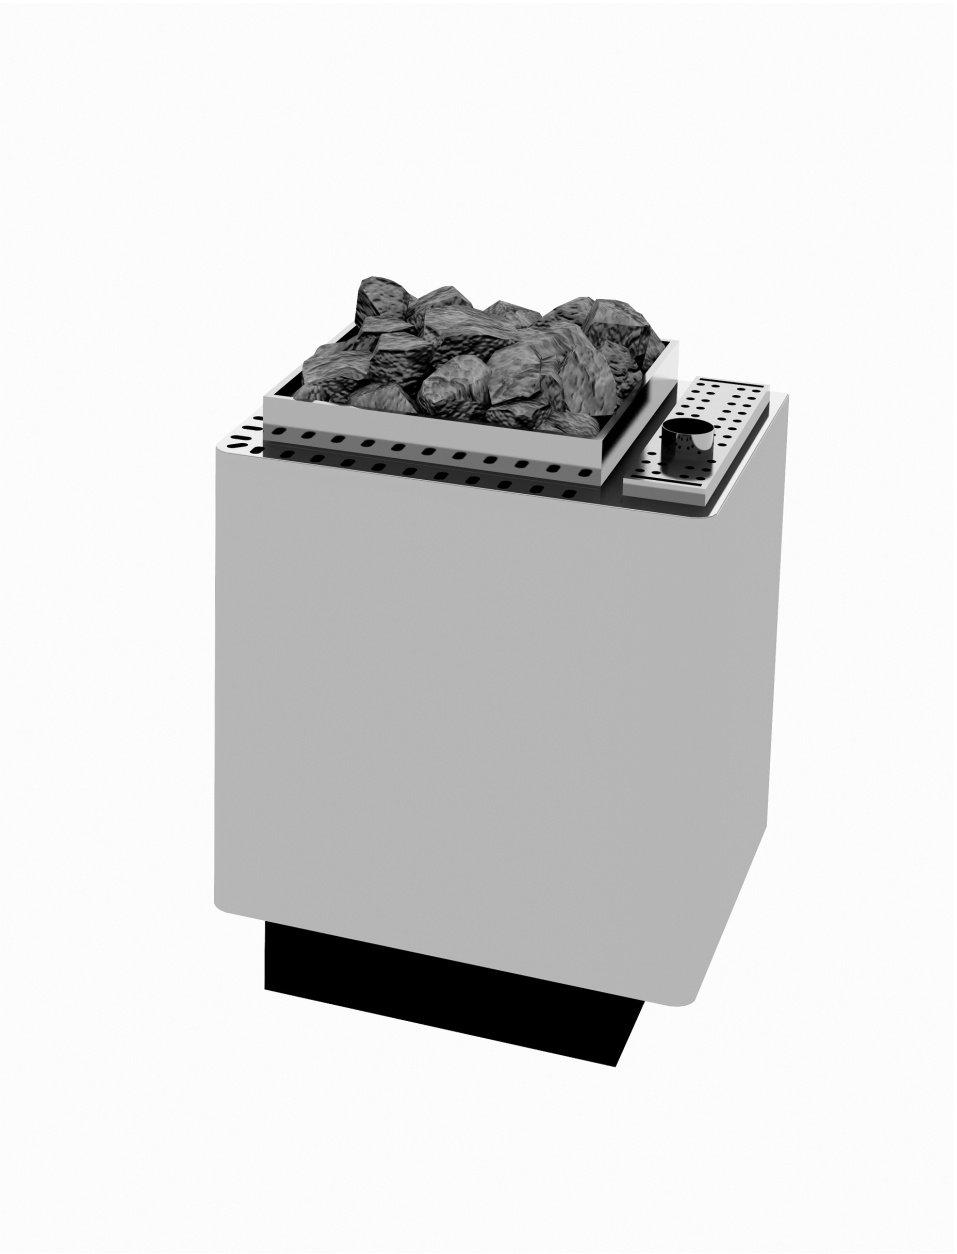 Sauna Horno 9,0 kW pared Modelo W de Therm tipo WK 45 (7,5 kW) con ...